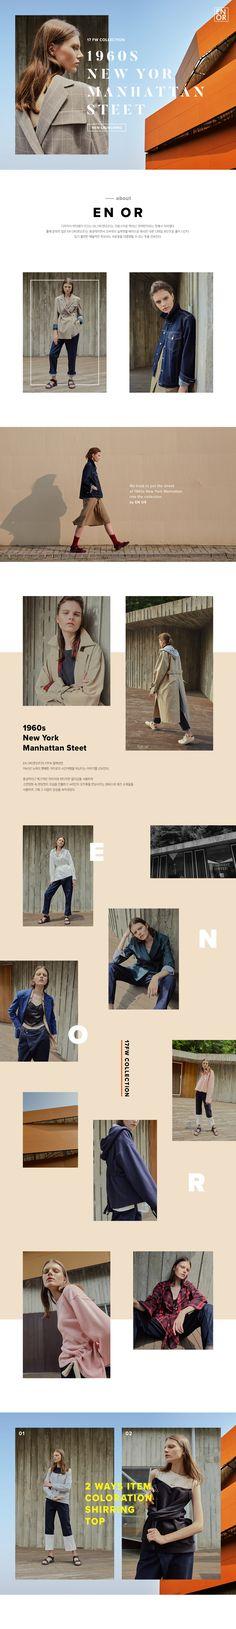 Fashion magazine layout editorial newsletter design ideas for 2019 Lookbook Layout, Lookbook Design, Email Newsletter Design, Email Design, Web Layout, Layout Design, Ppt Design, Email Layout, Graphic Design